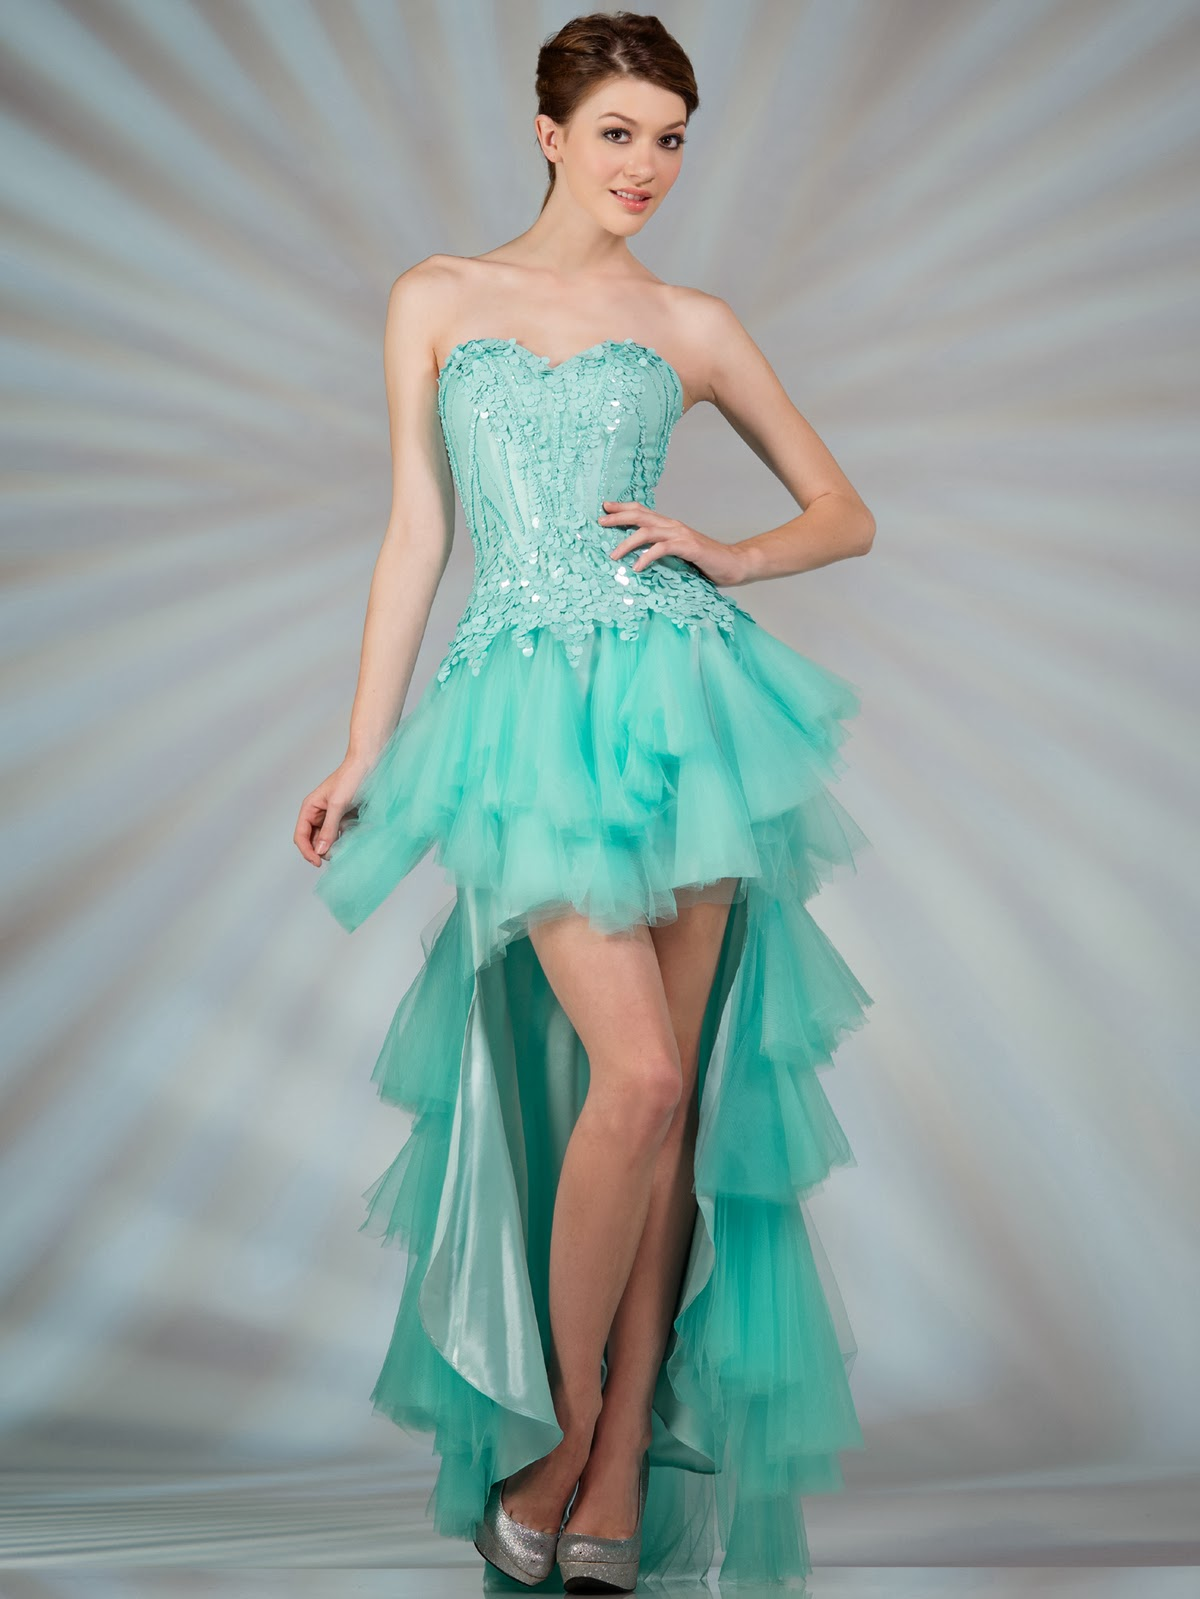 dressybridal 2014 prom color trendstunning aqua blue